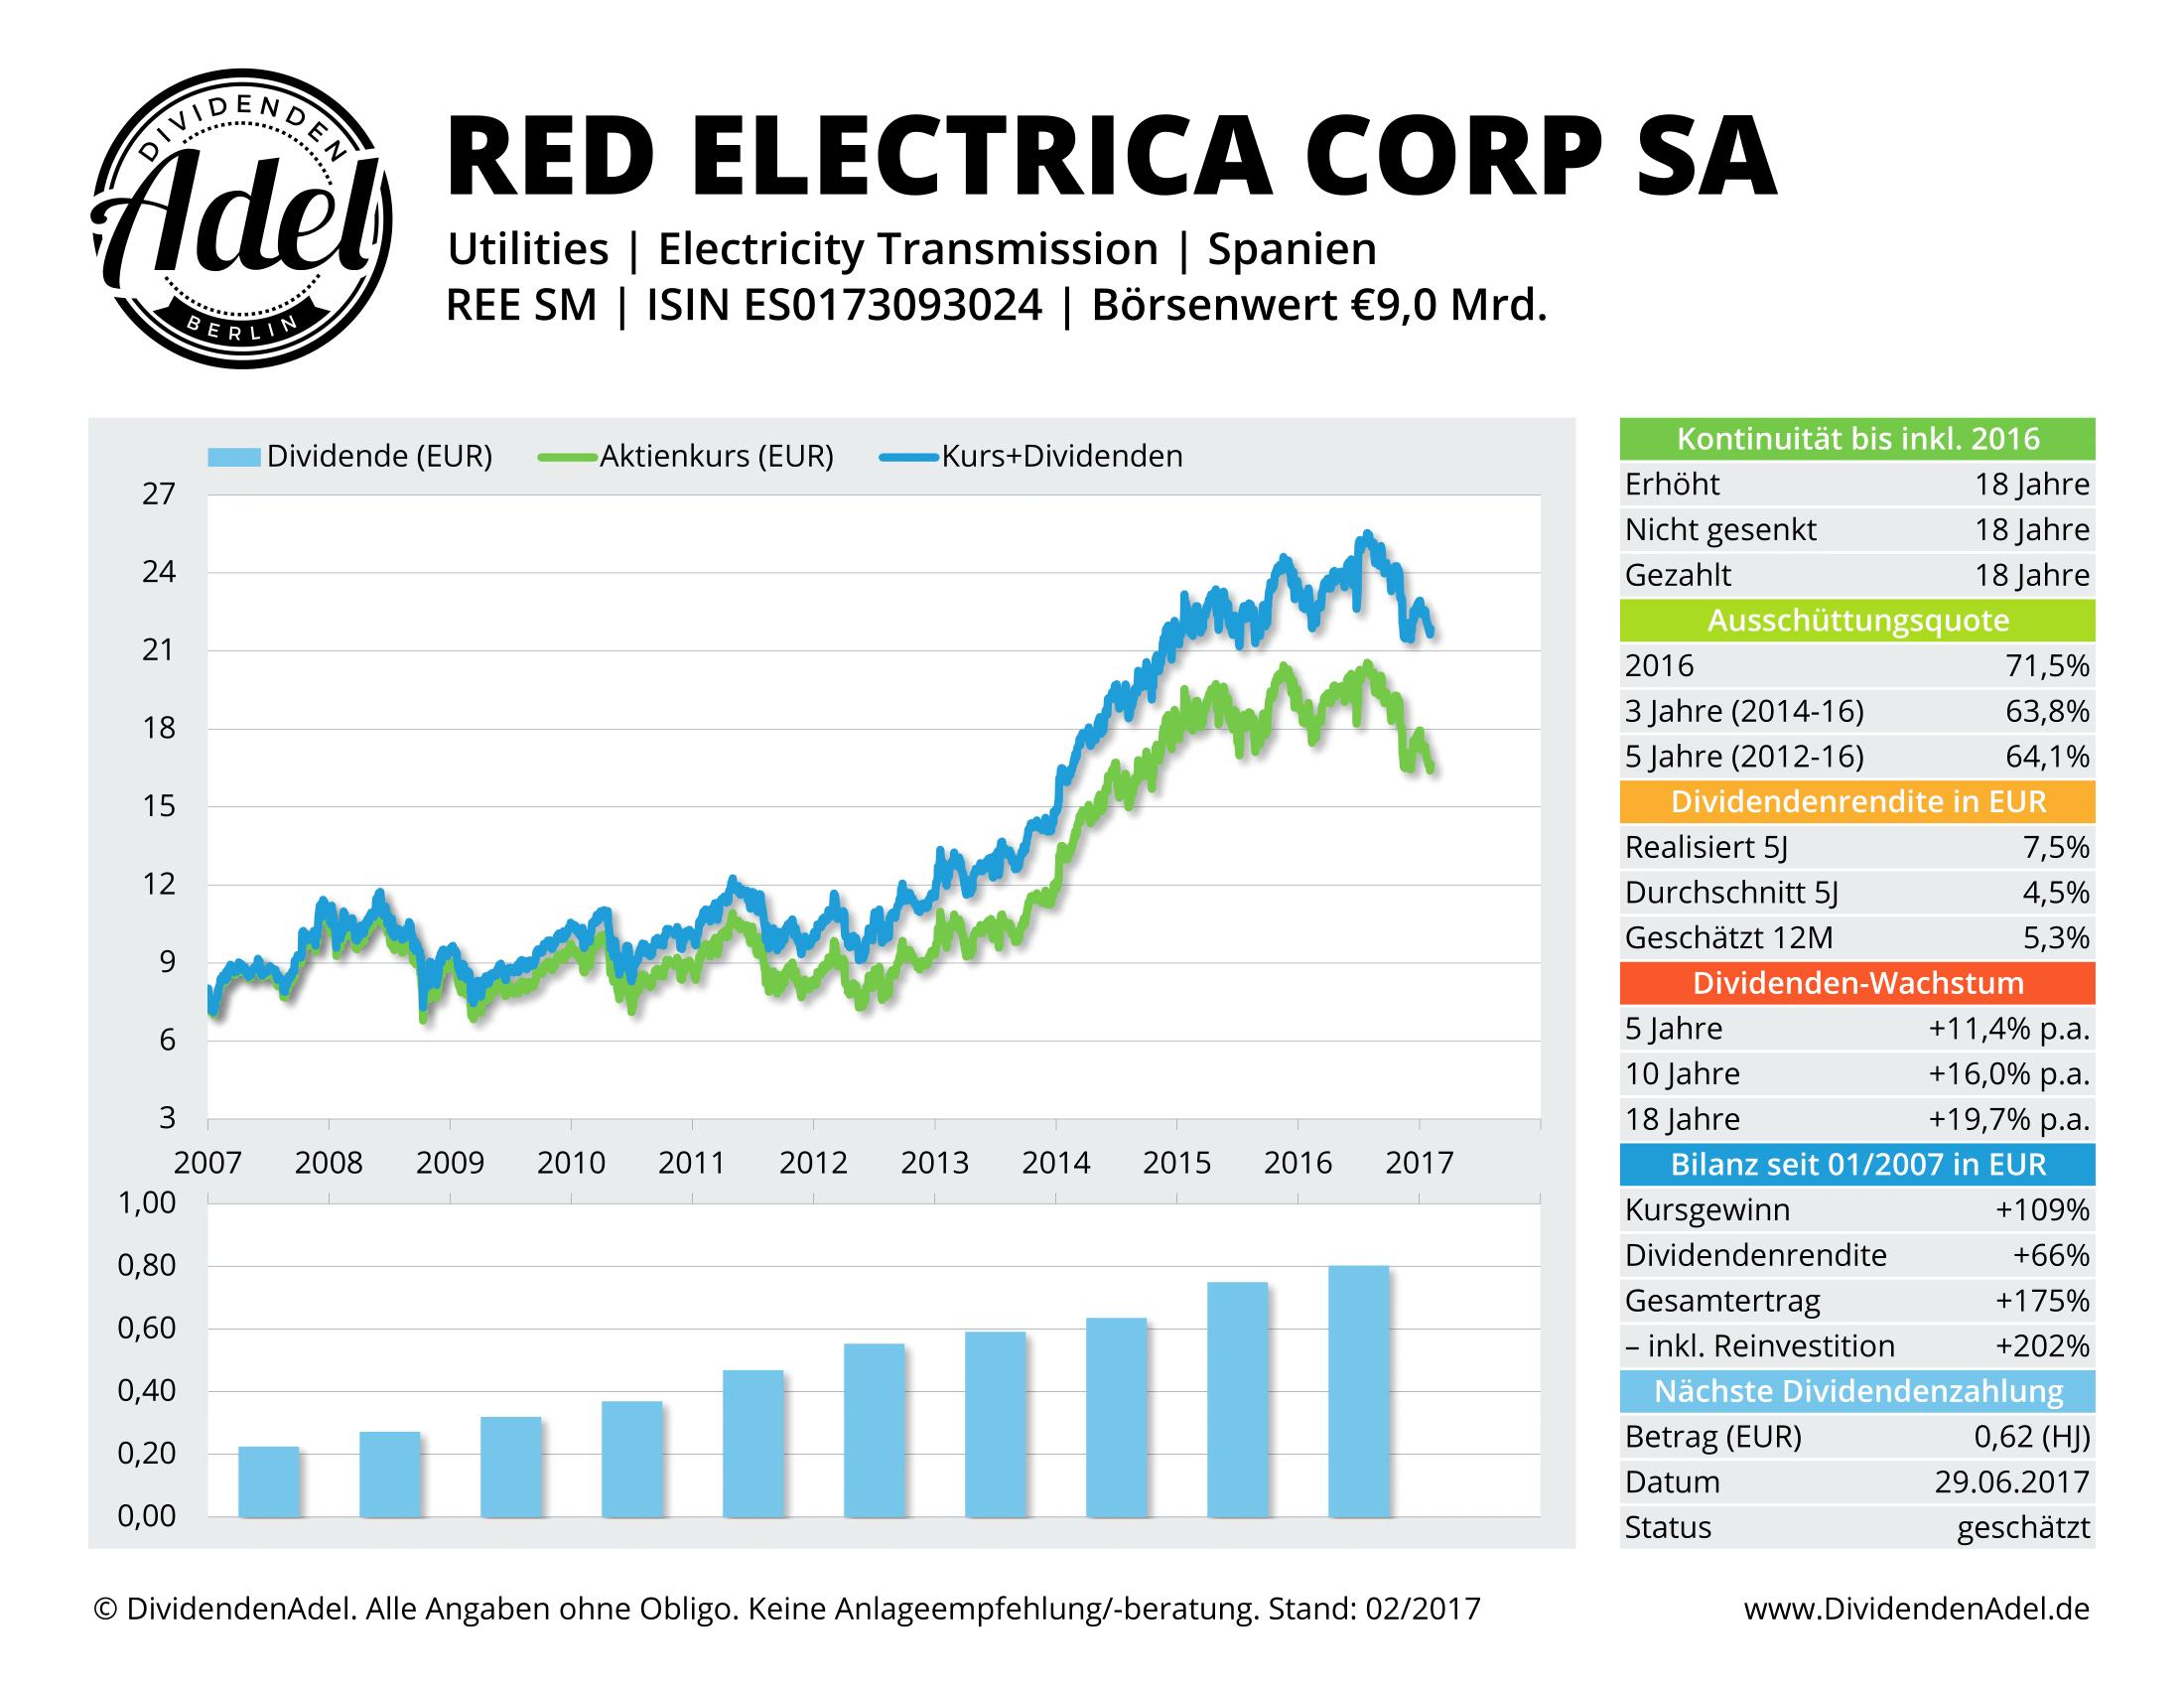 DividendenAdel Dividendenprofil Red Electrica